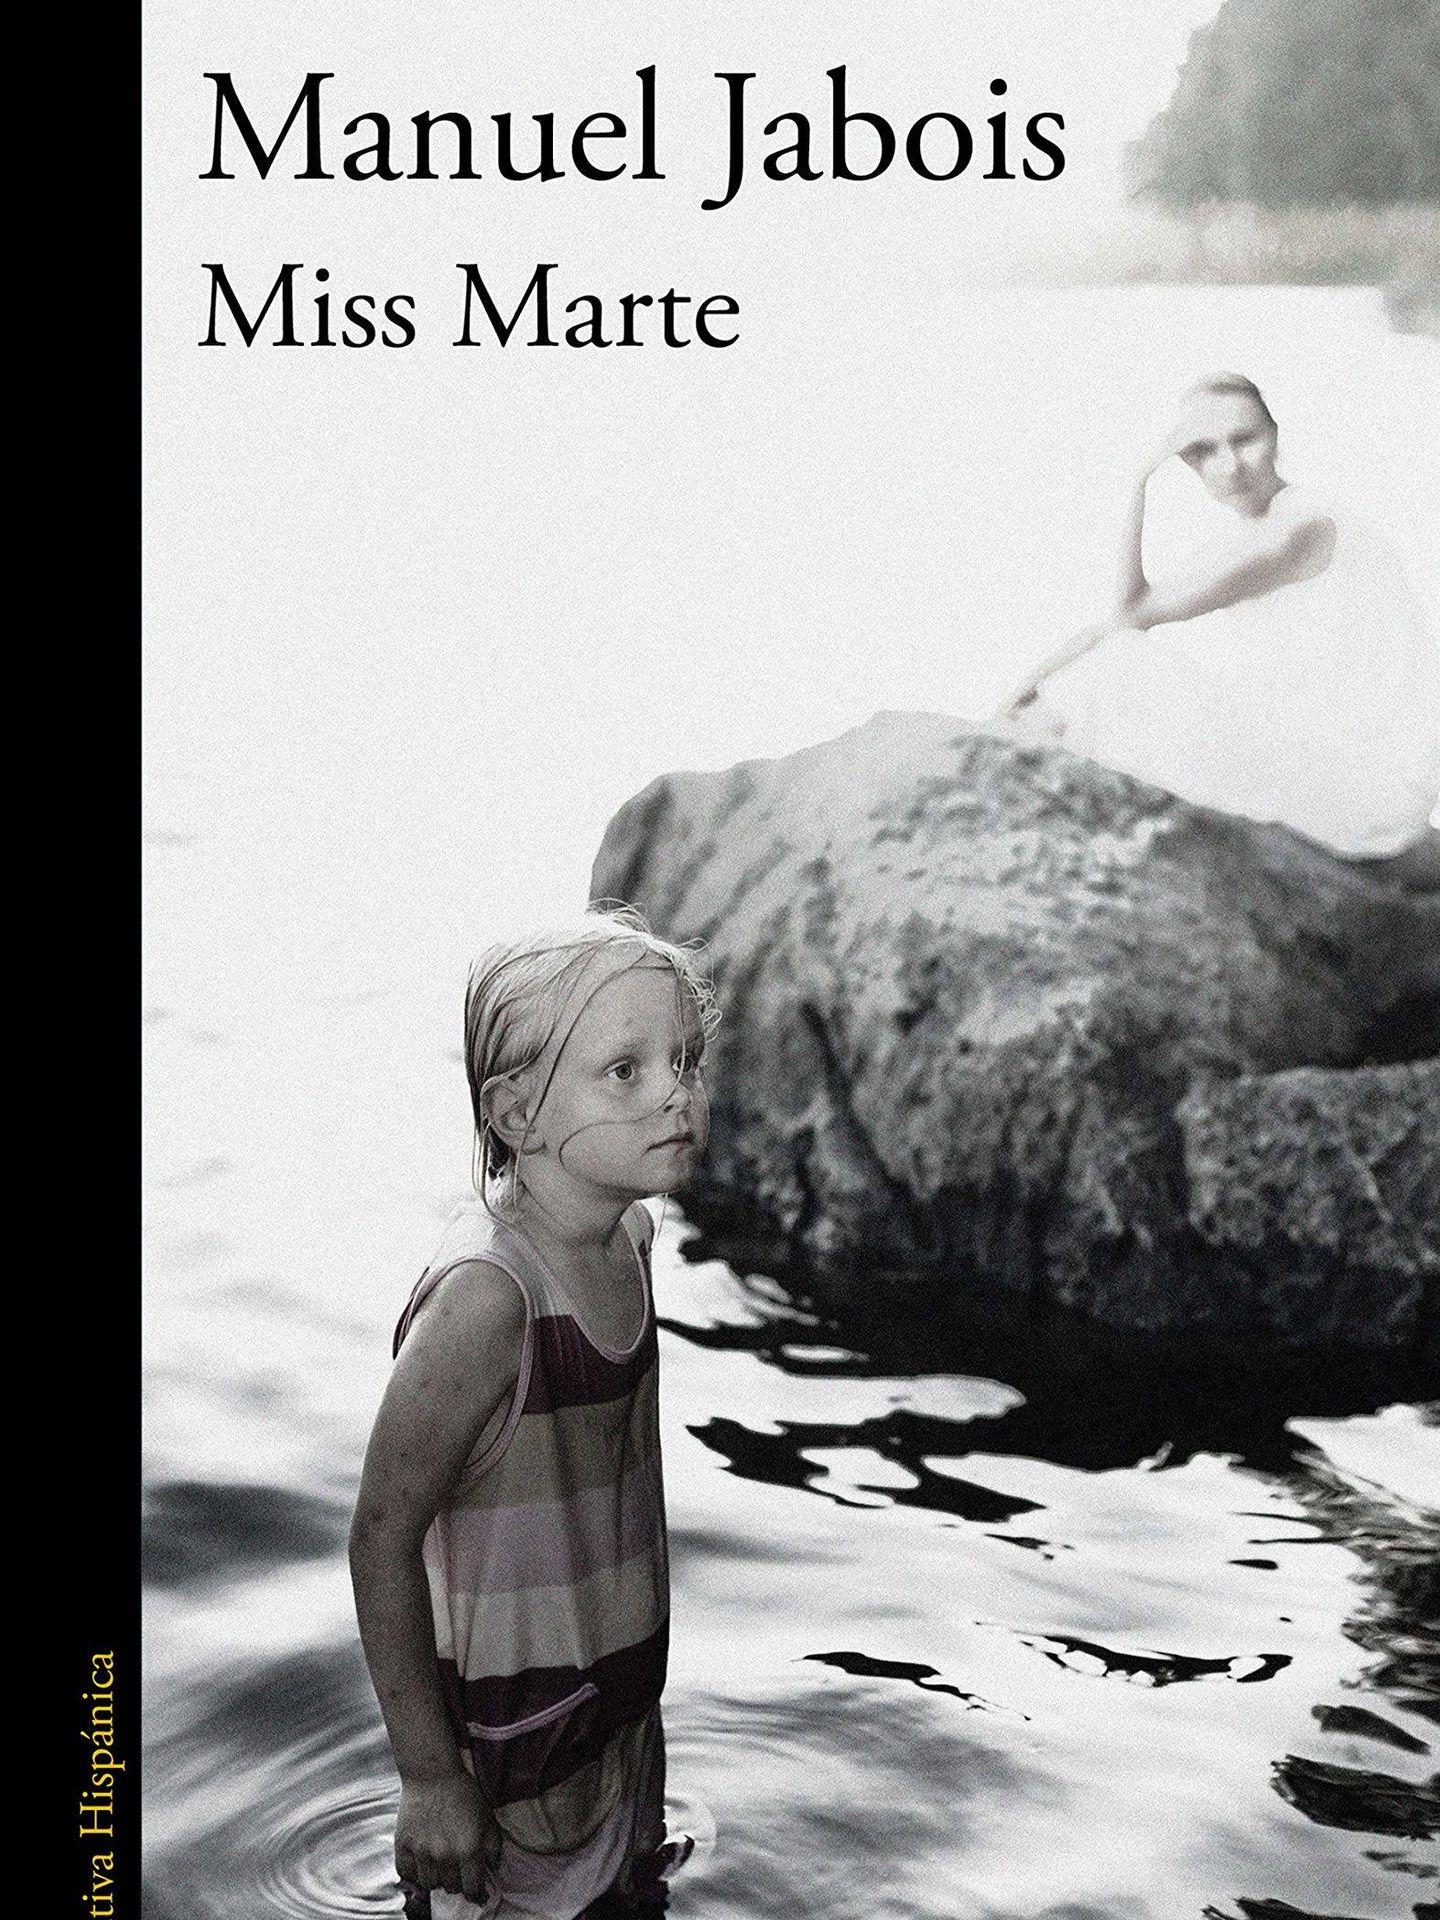 'Miss Marte'